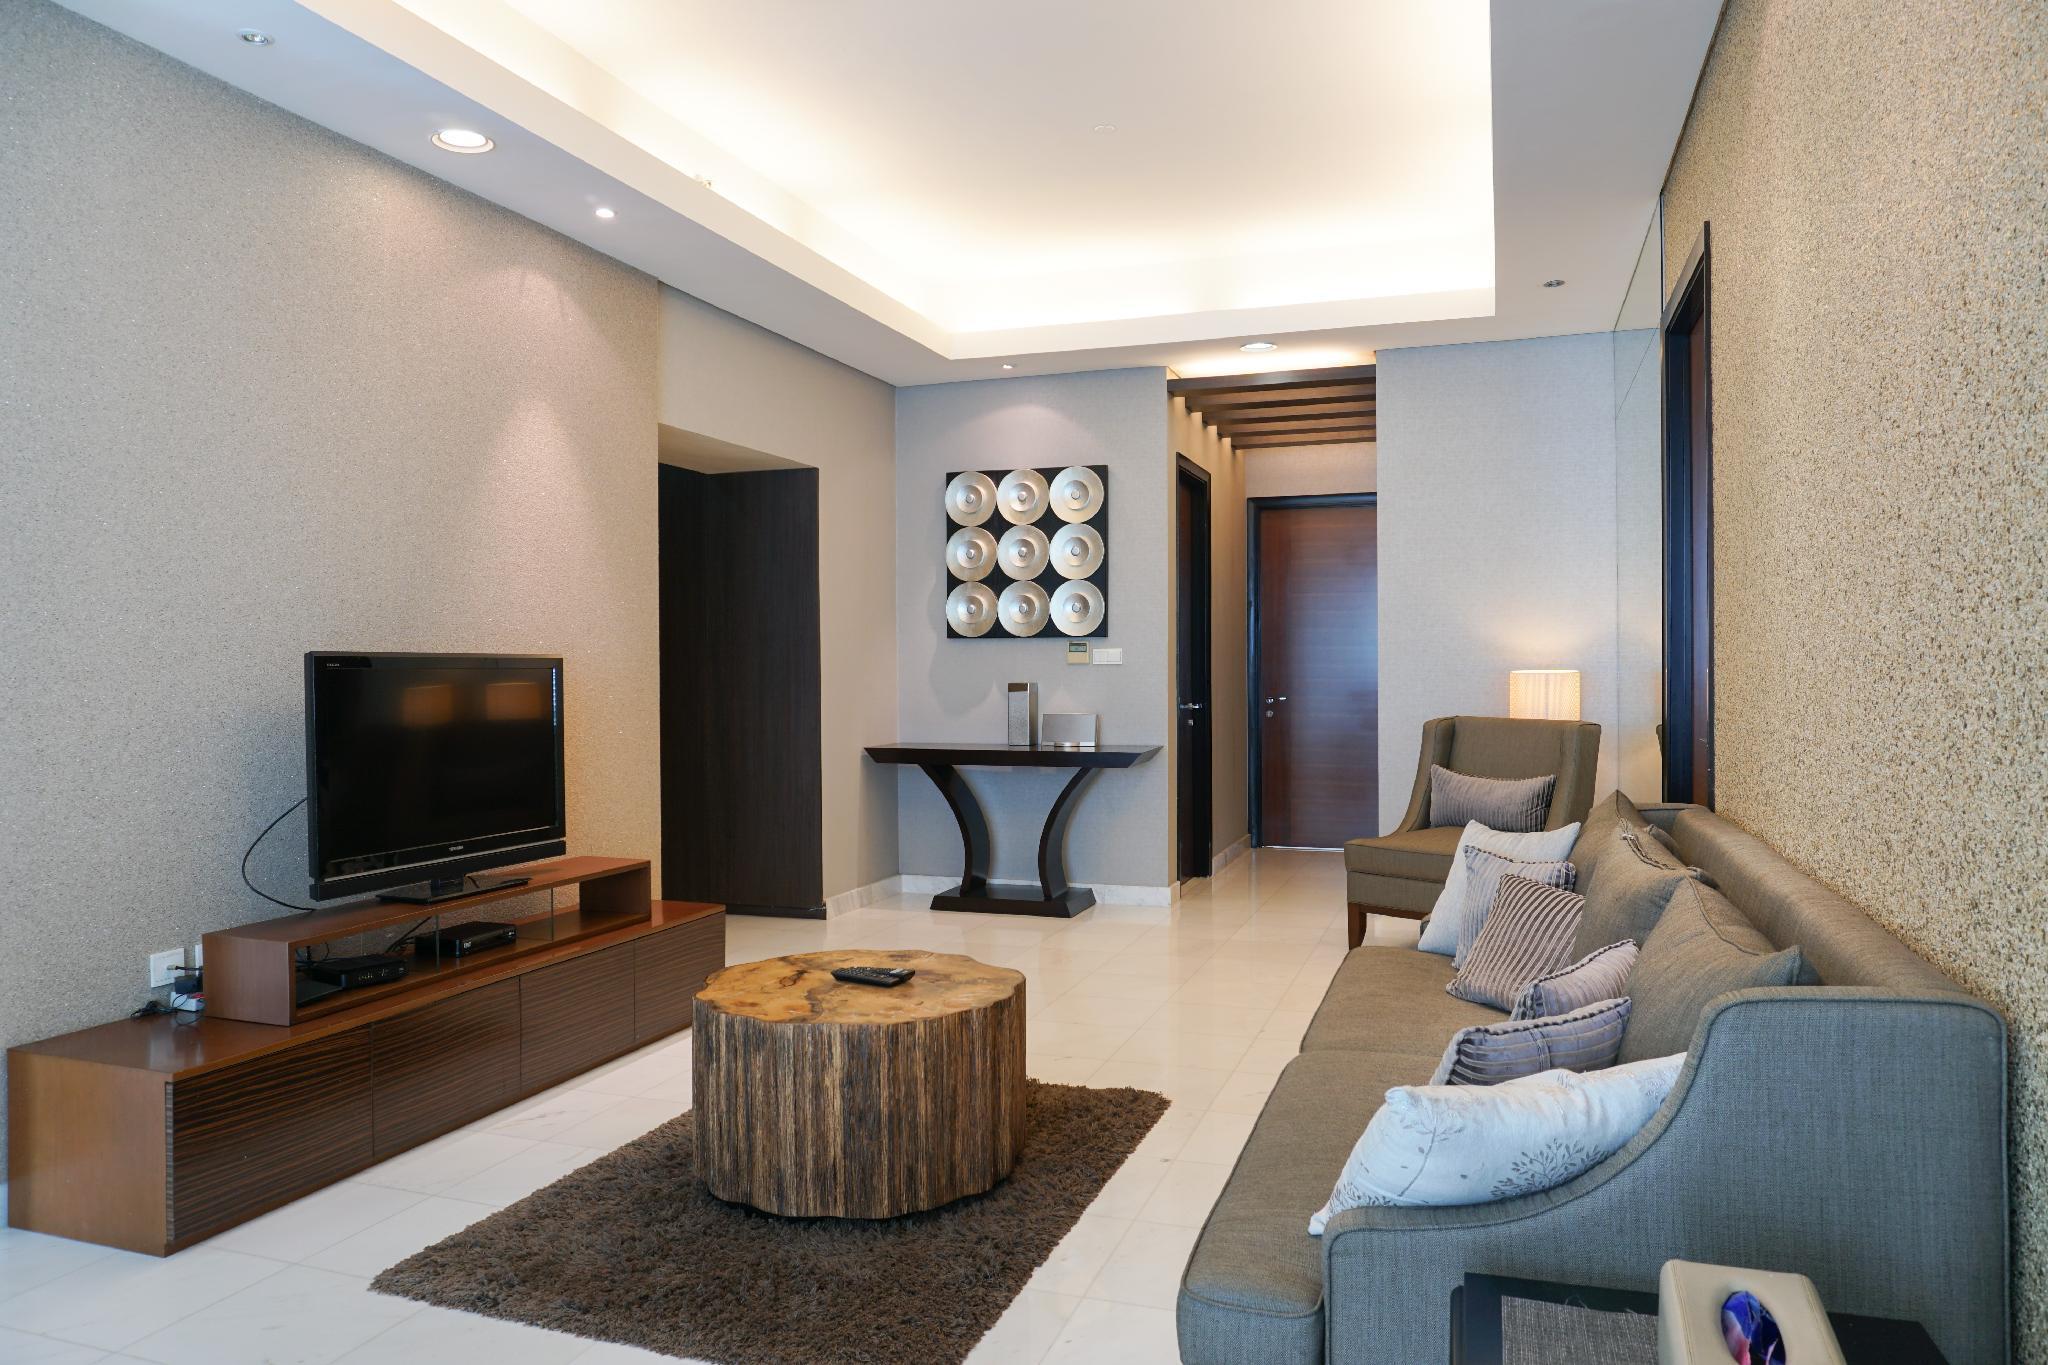 Luxury 2BR At The Peak Apartment By Travelio